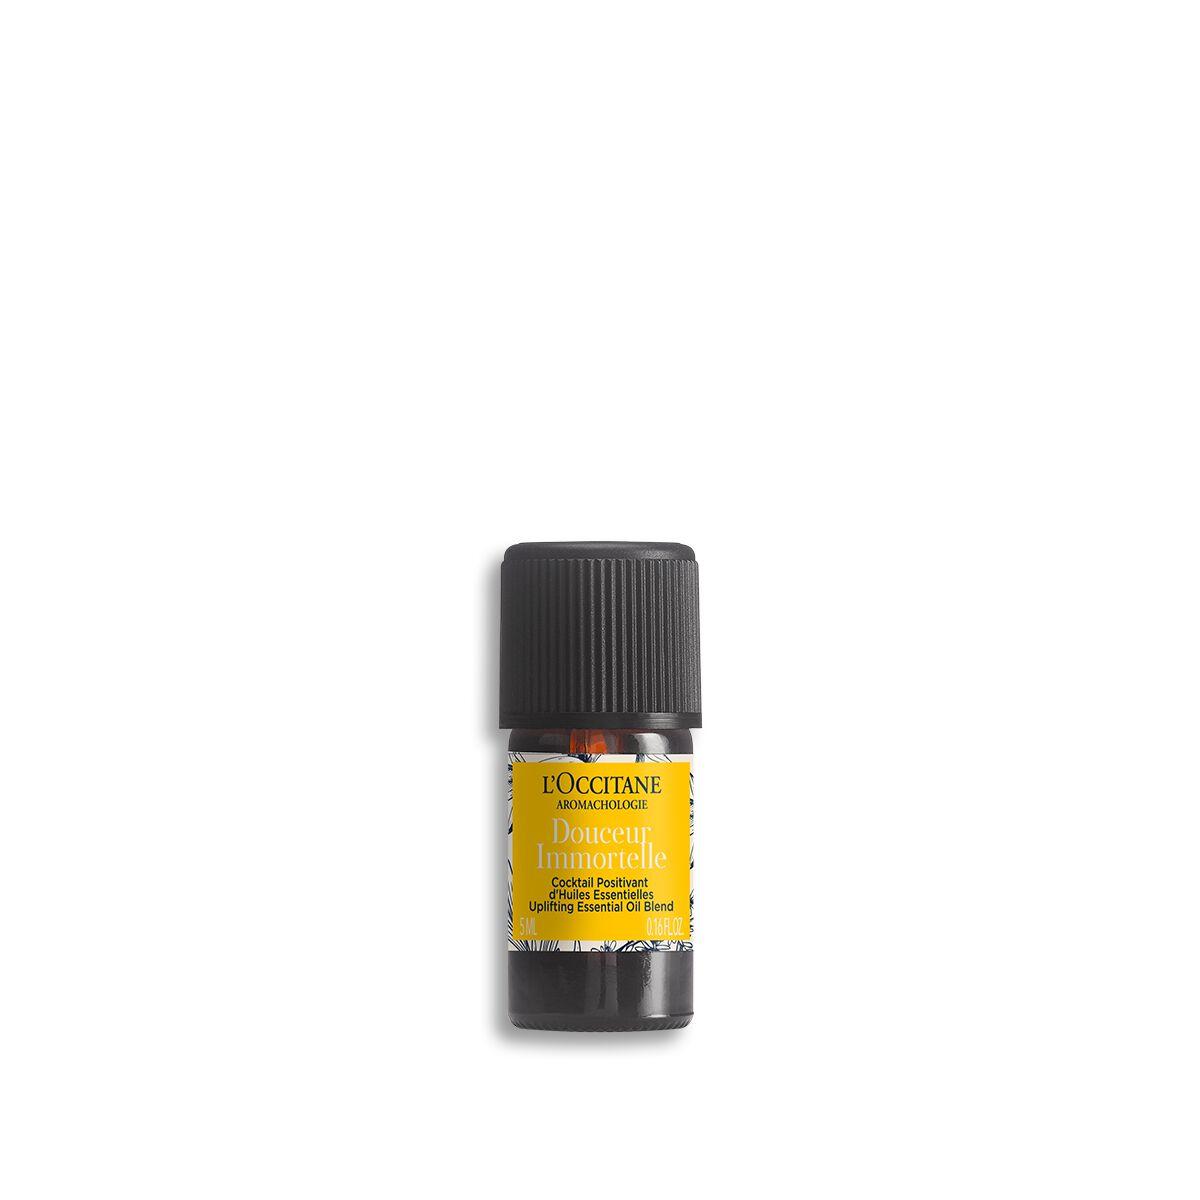 Uplifting Essential Oil Blend 5 ml.